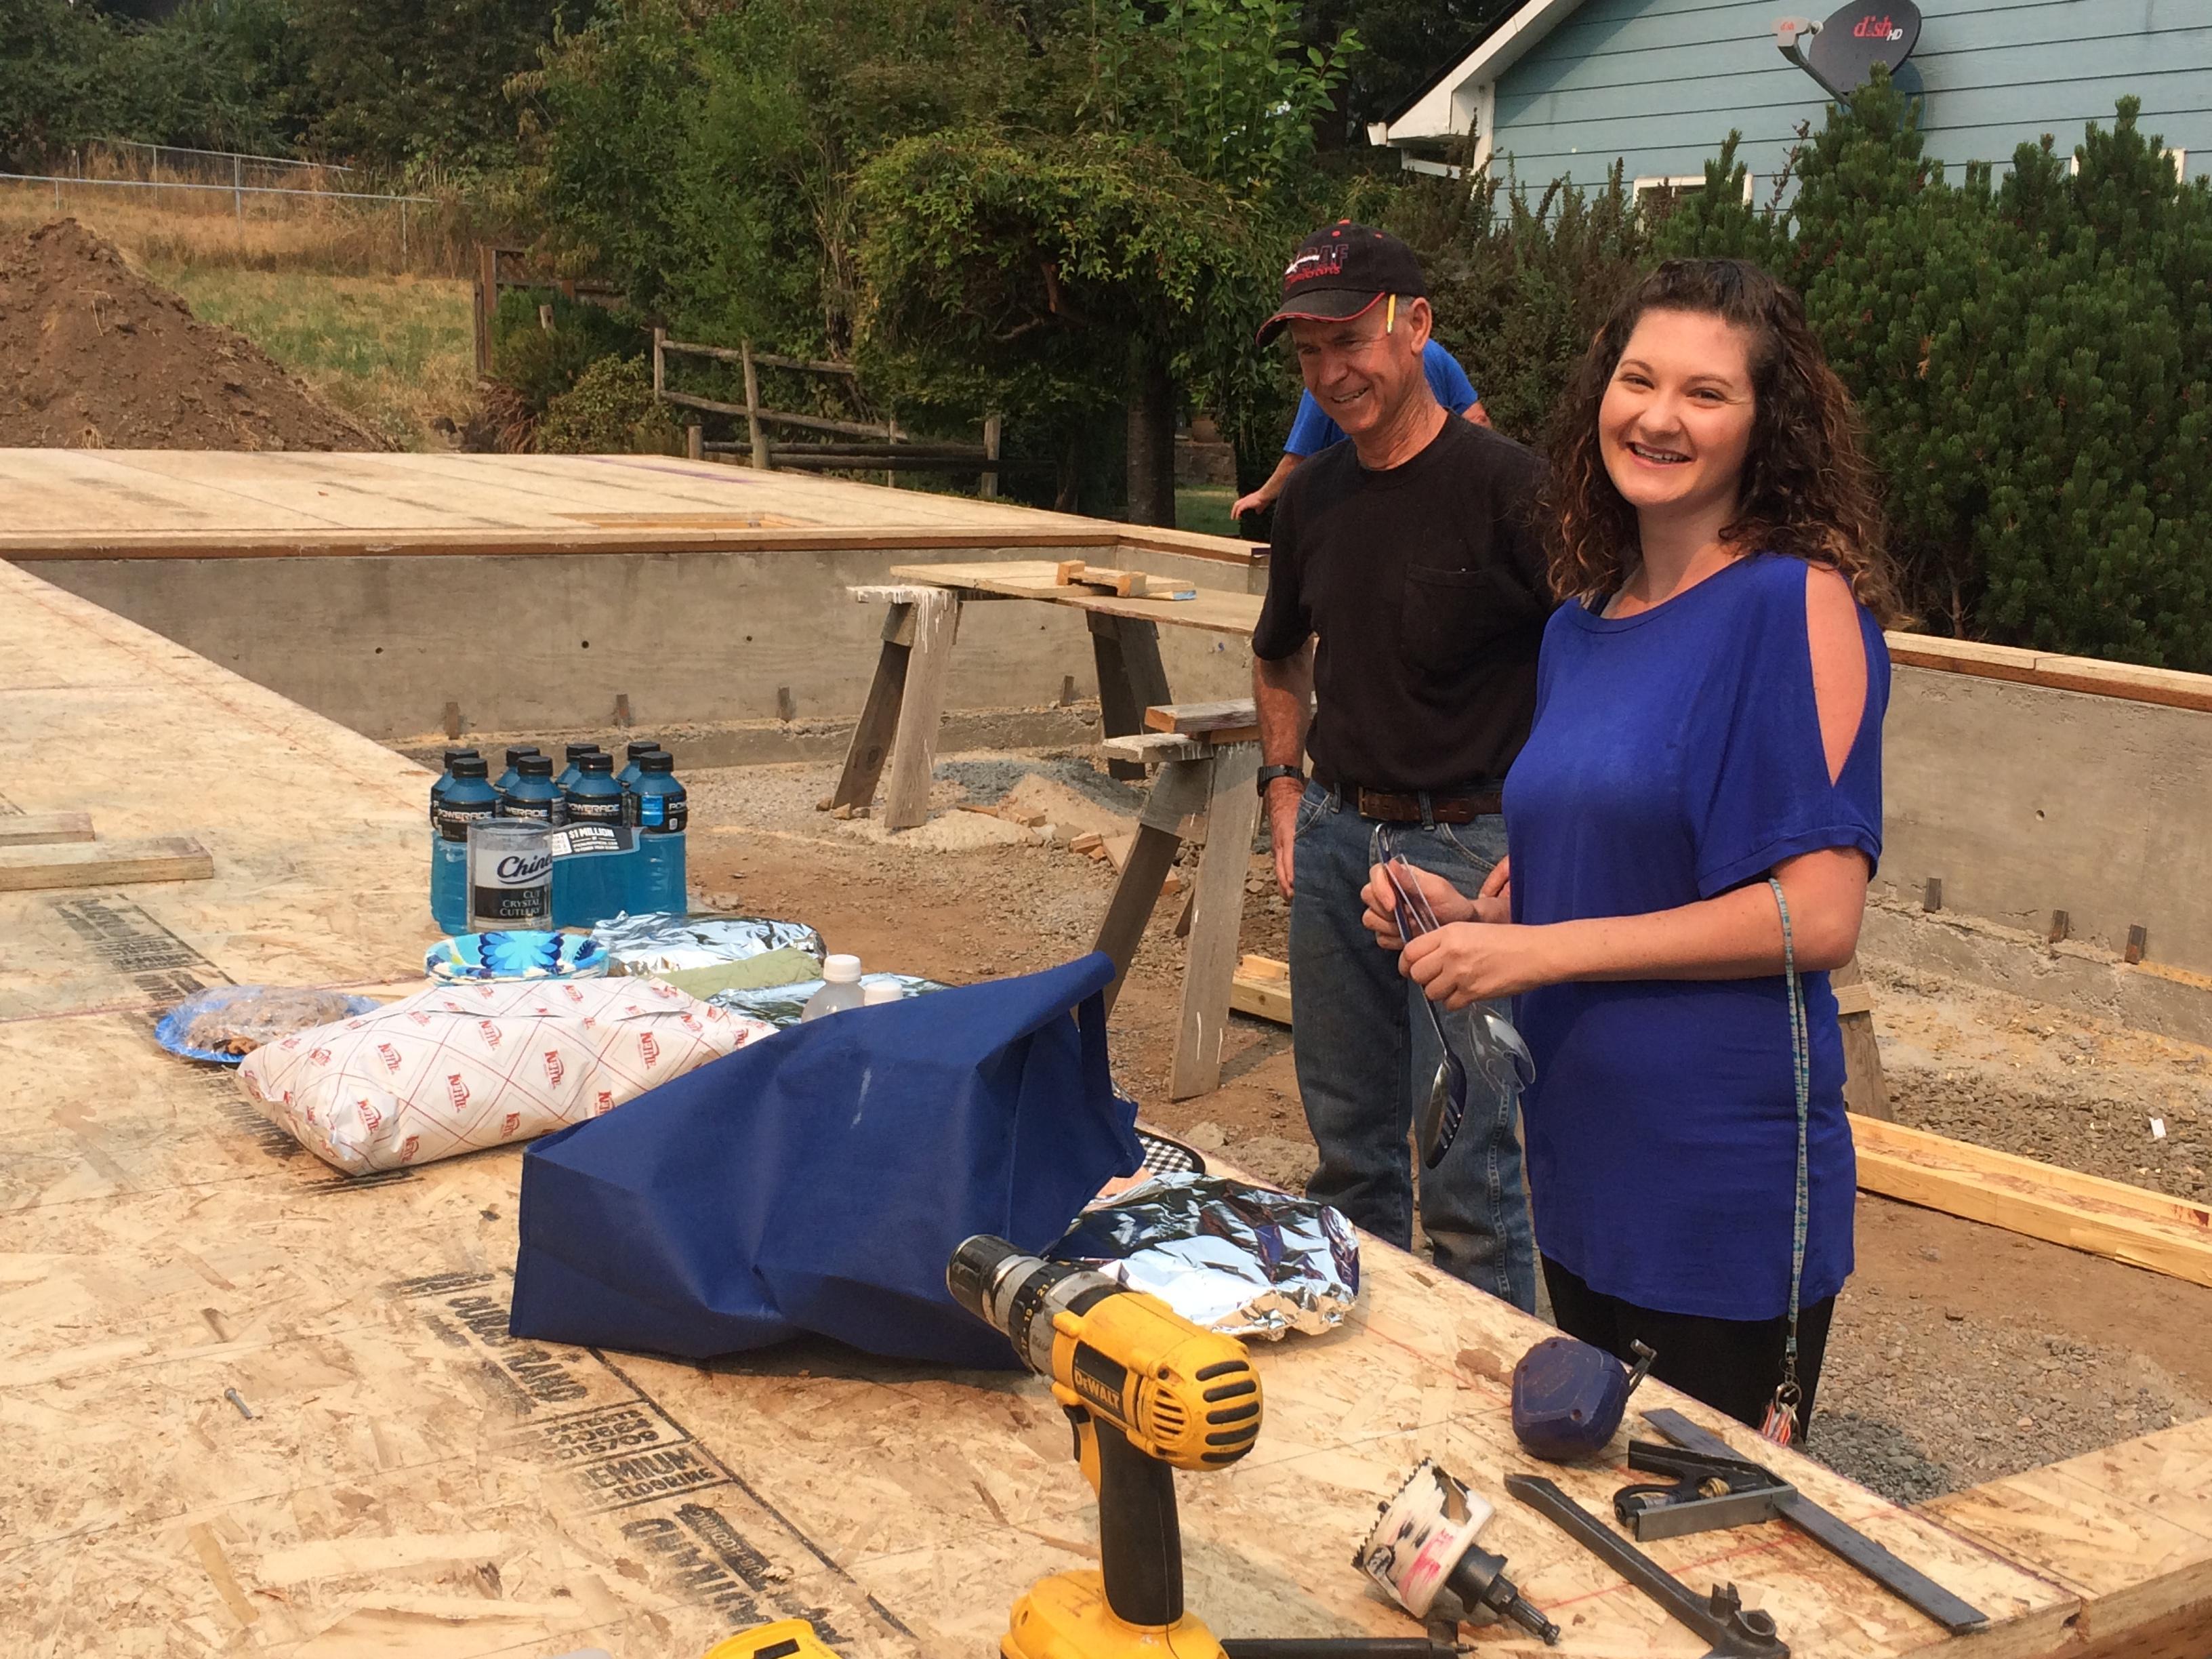 Feeding the construction volunteers